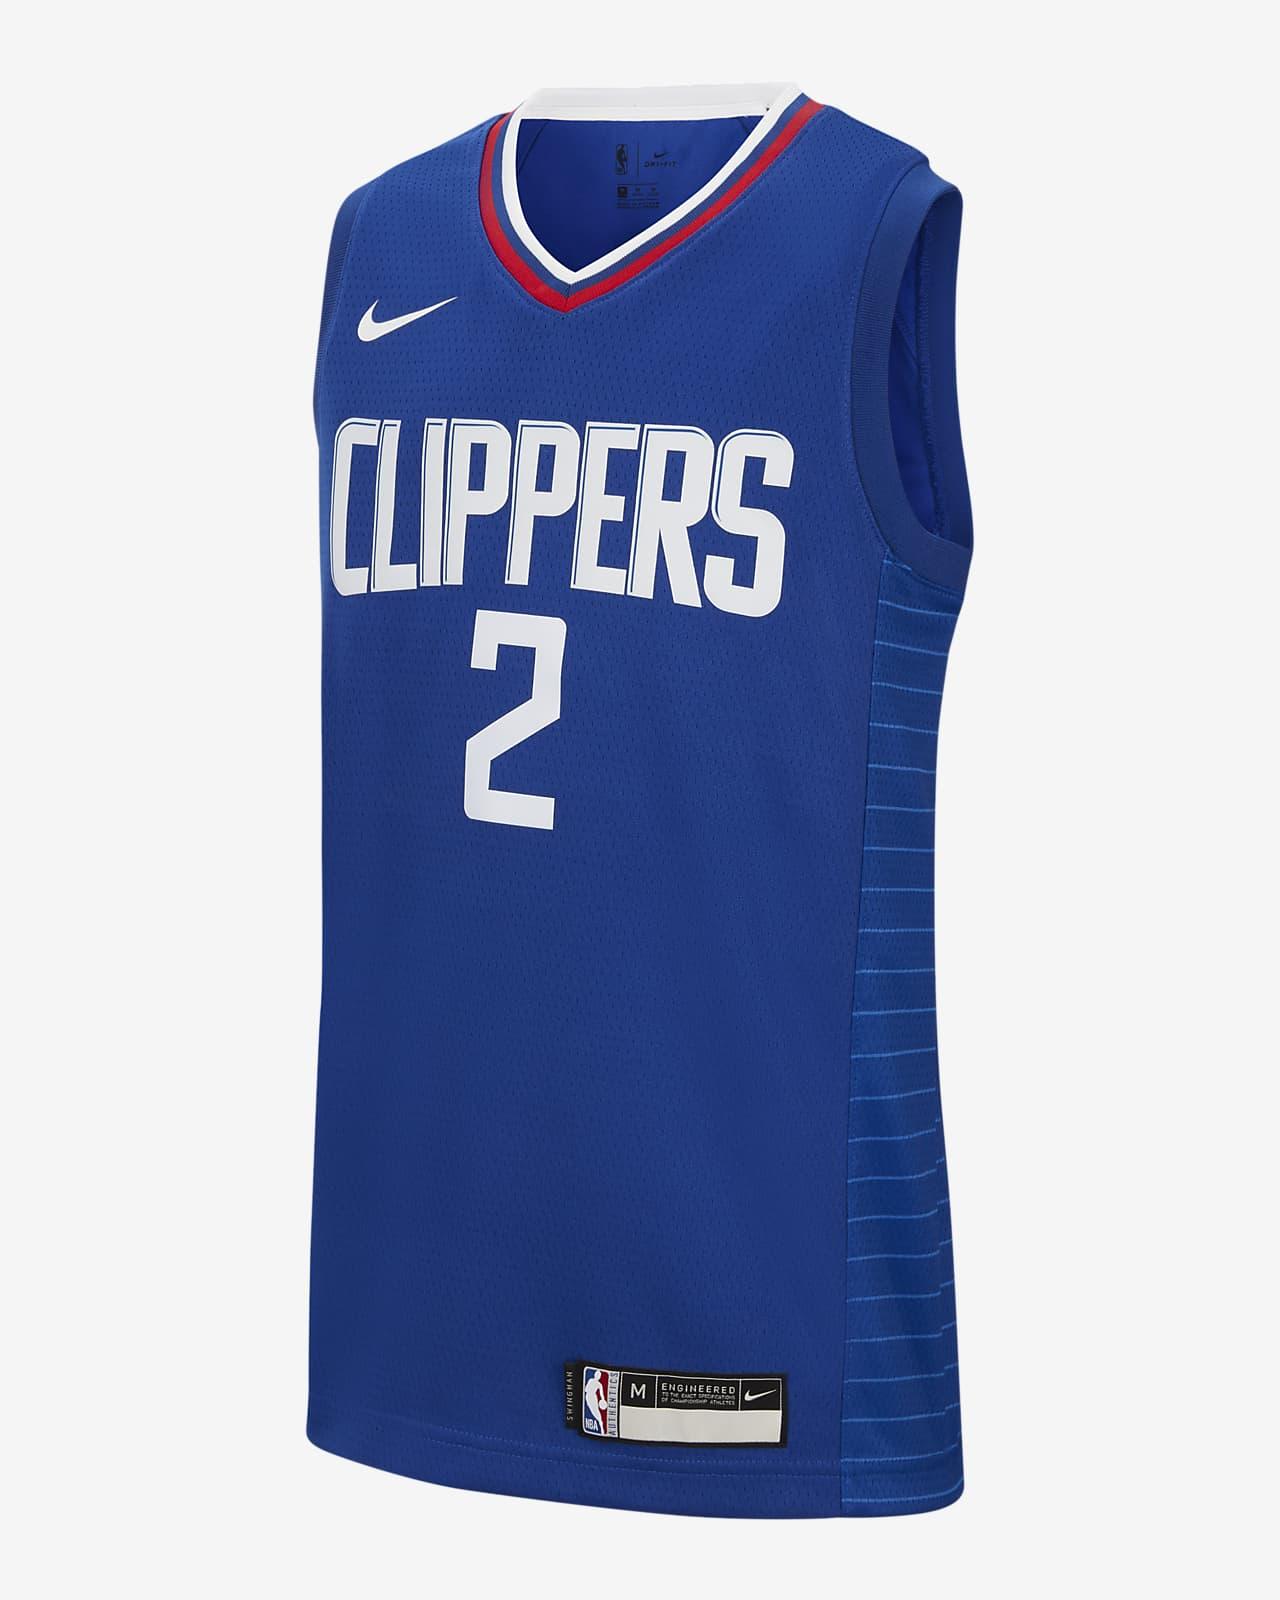 Kawhi Leonard Clippers Icon Edition Camiseta Nike NBA Swingman - Niño/a